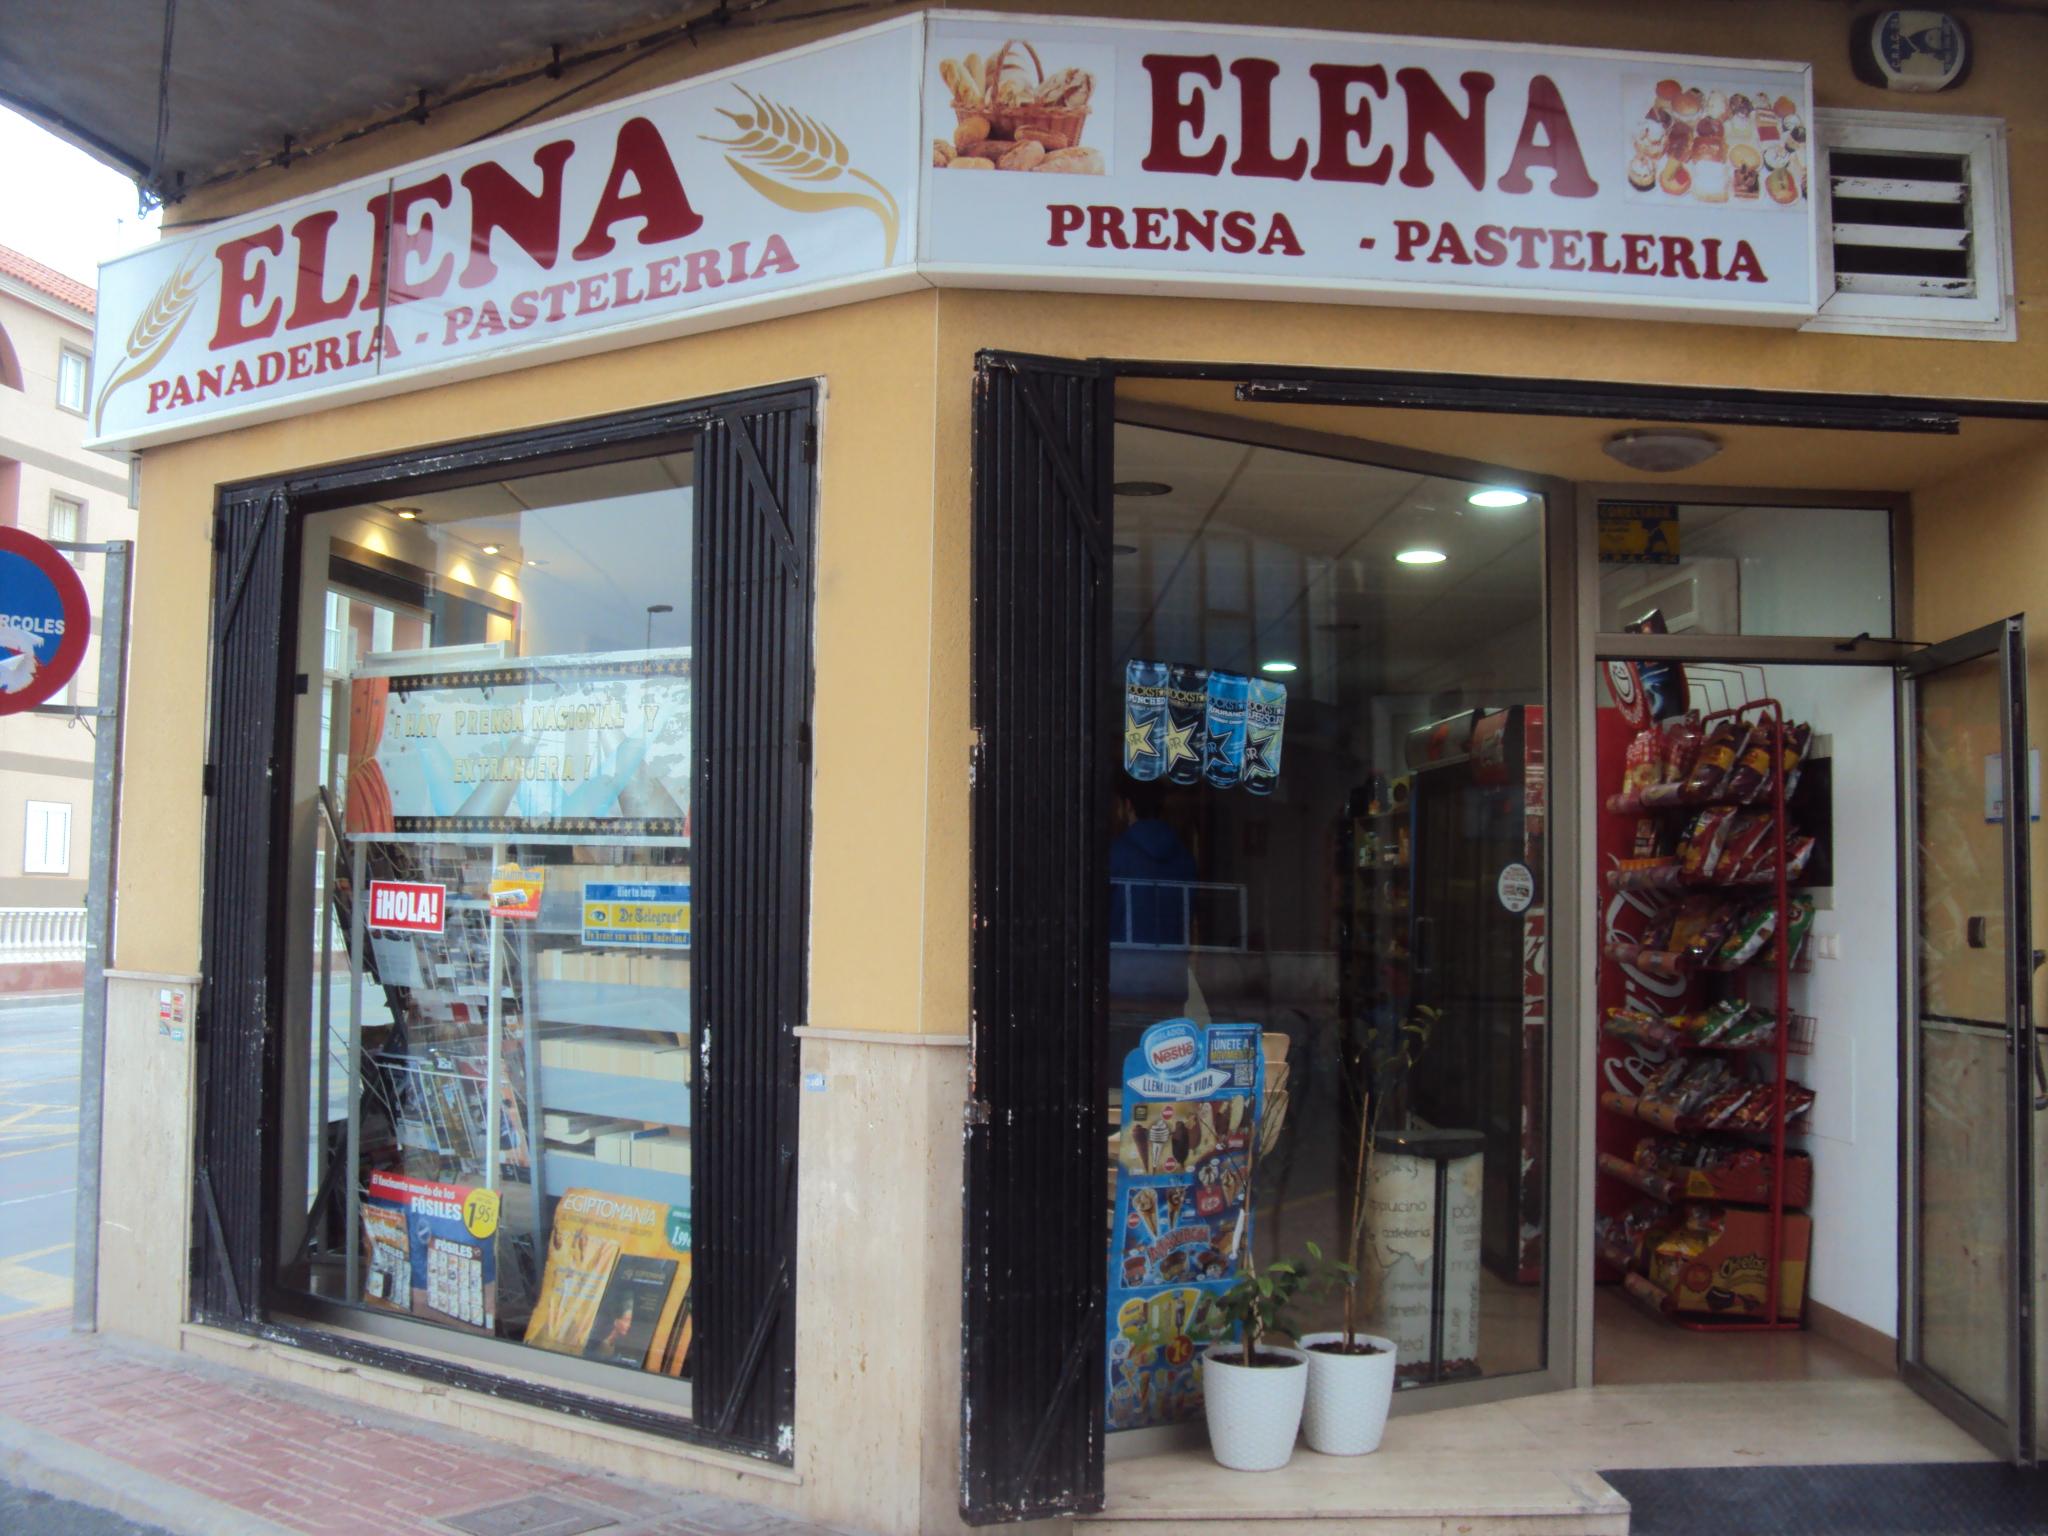 ELENA PANADERIA